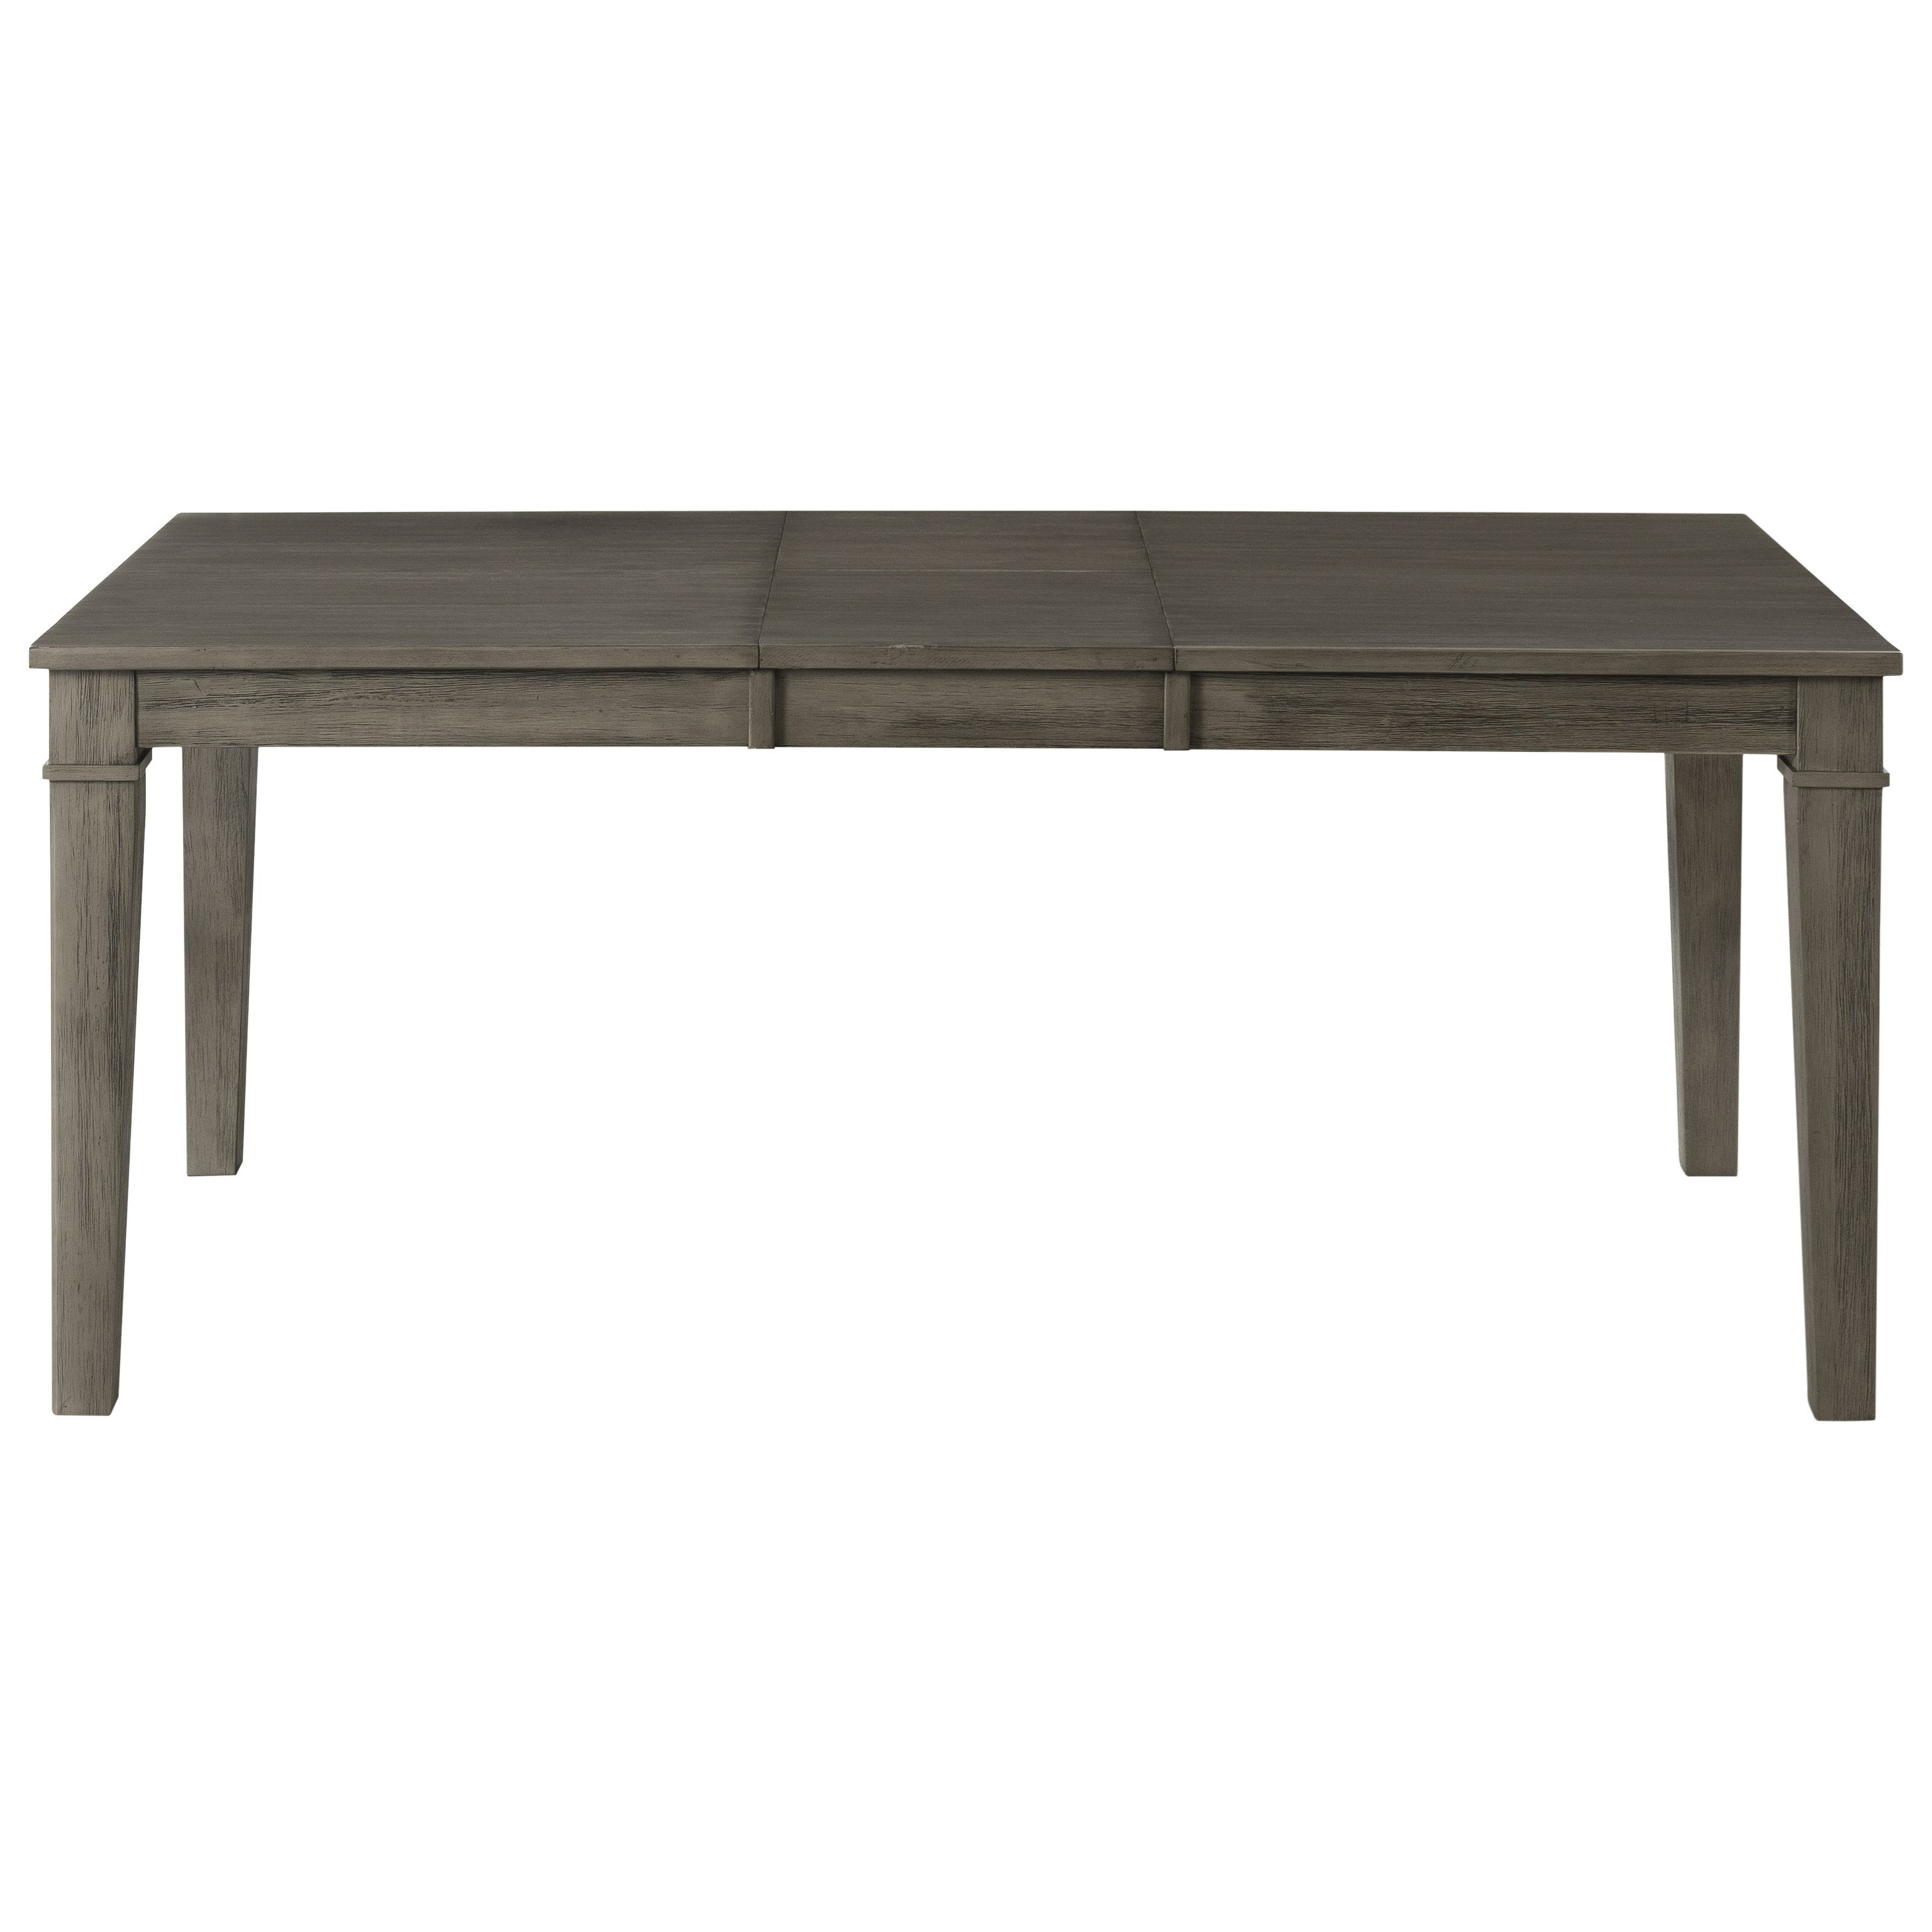 Huron Rectangular Standard Height Leg Table by A-A at Walker's Furniture